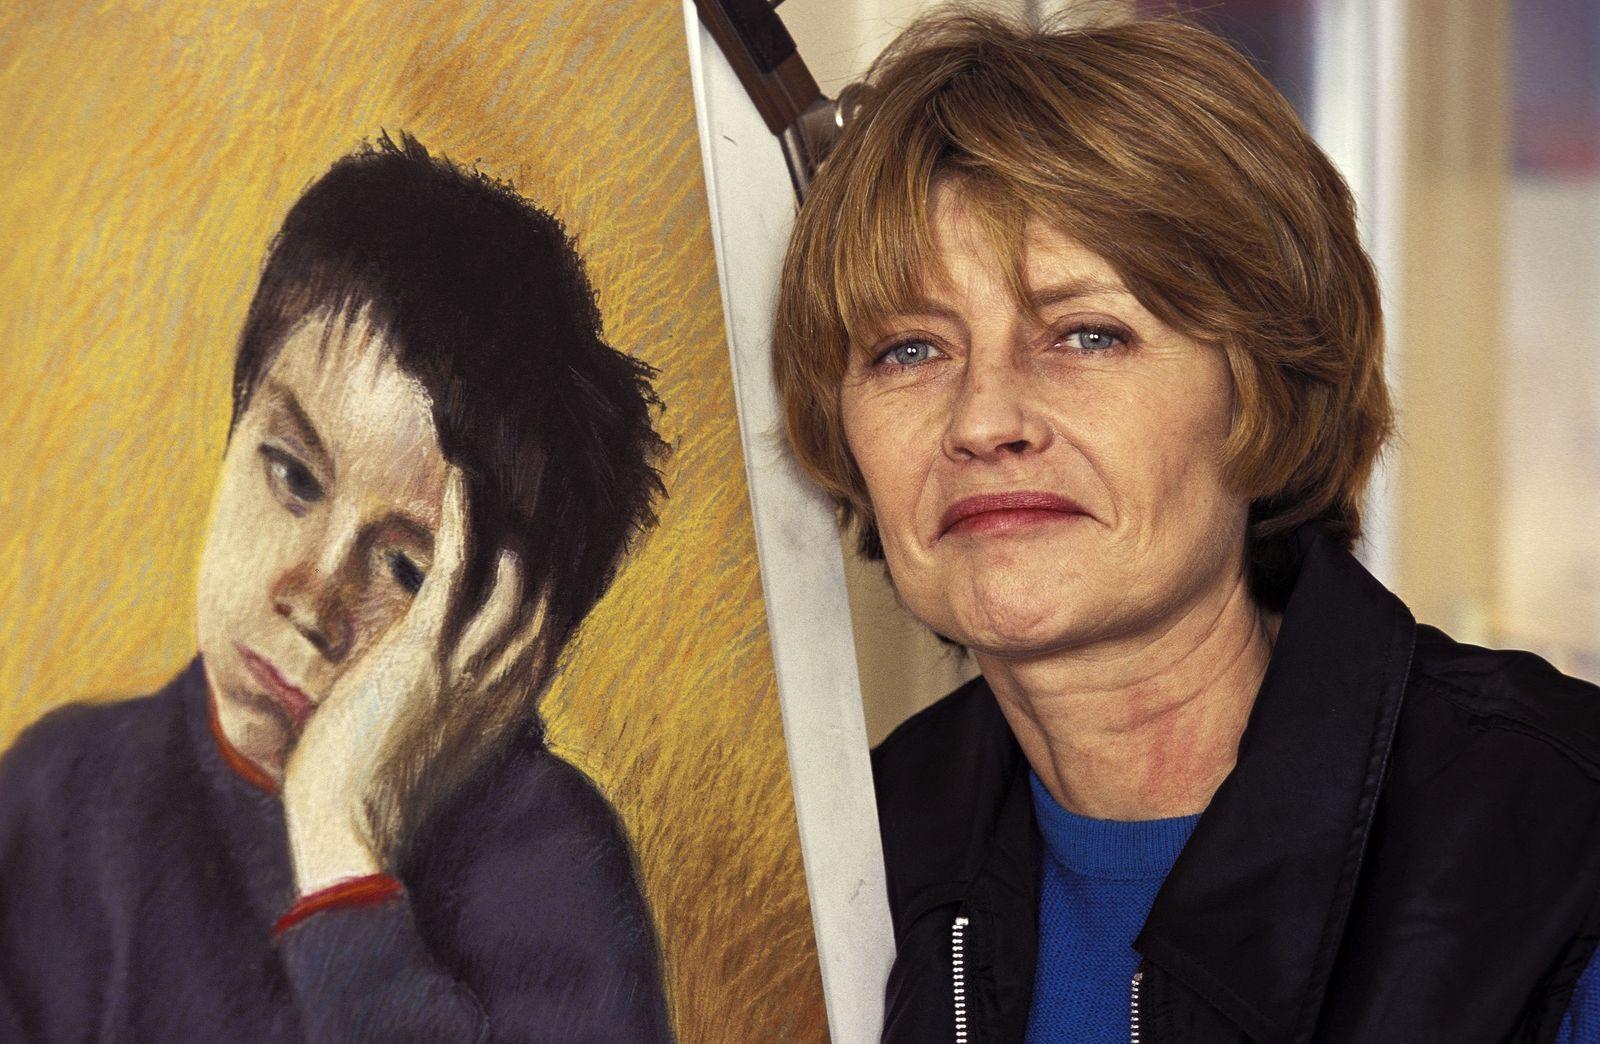 """Les Etats D'Art de La B.D."" At Coprim Foundation In Paris, France On January 01, 1997."